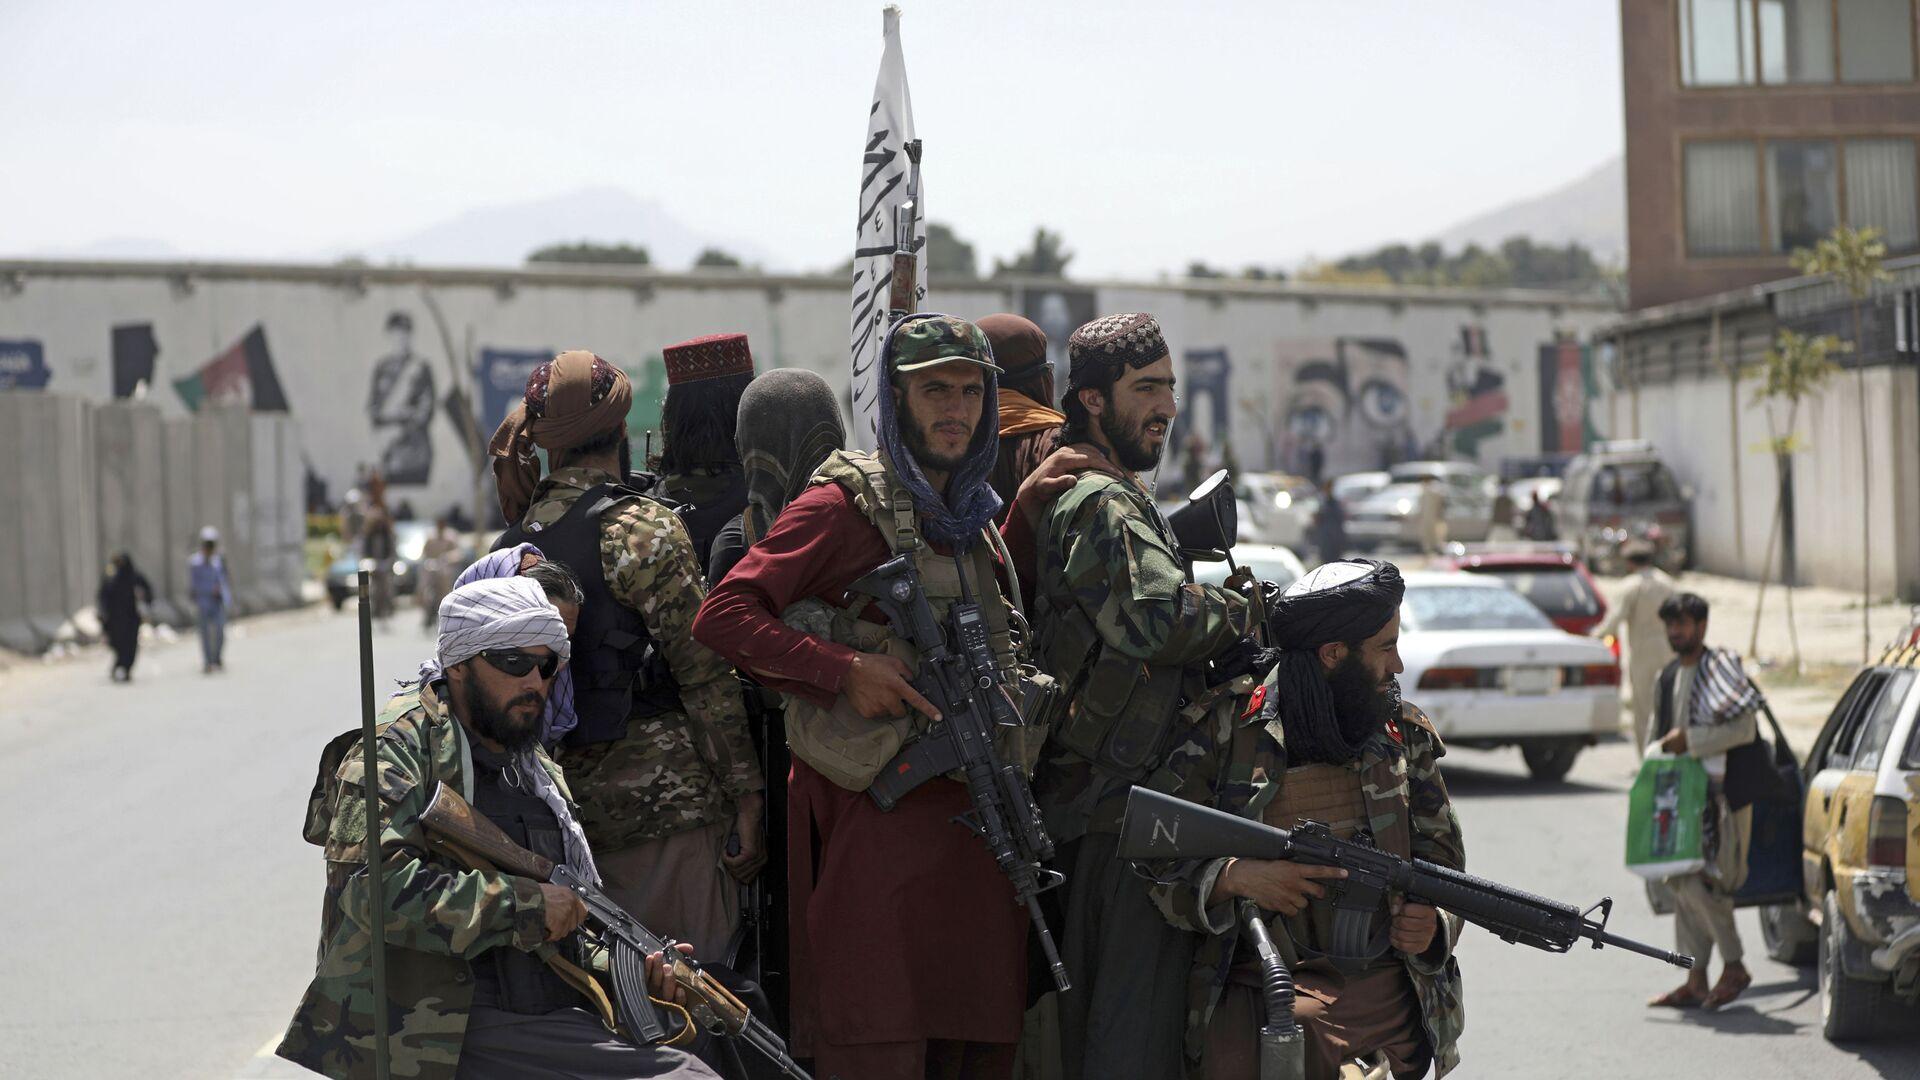 Taliban-Kämpfer in Kabul, Afghanistan - SNA, 1920, 03.10.2021